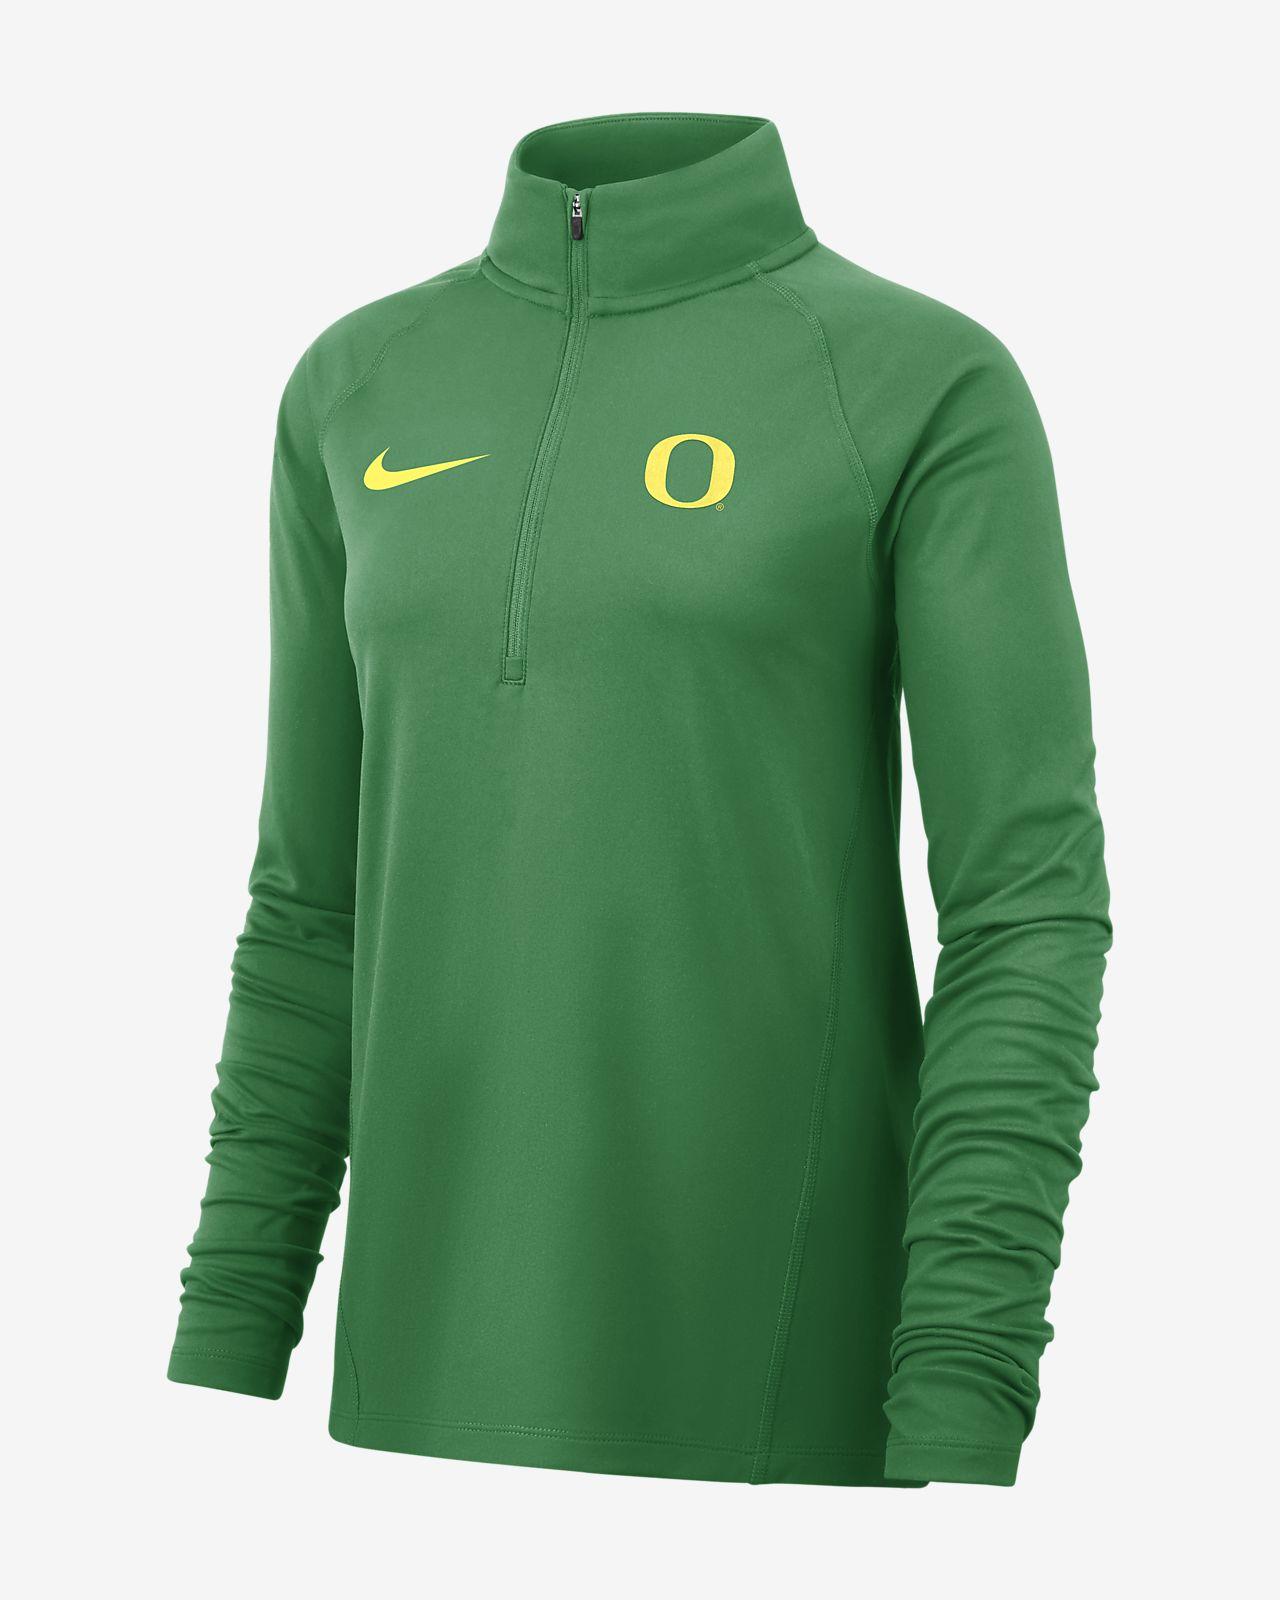 Nike College Therma (Oregon) Women's Long-Sleeve 1/2-Zip Top